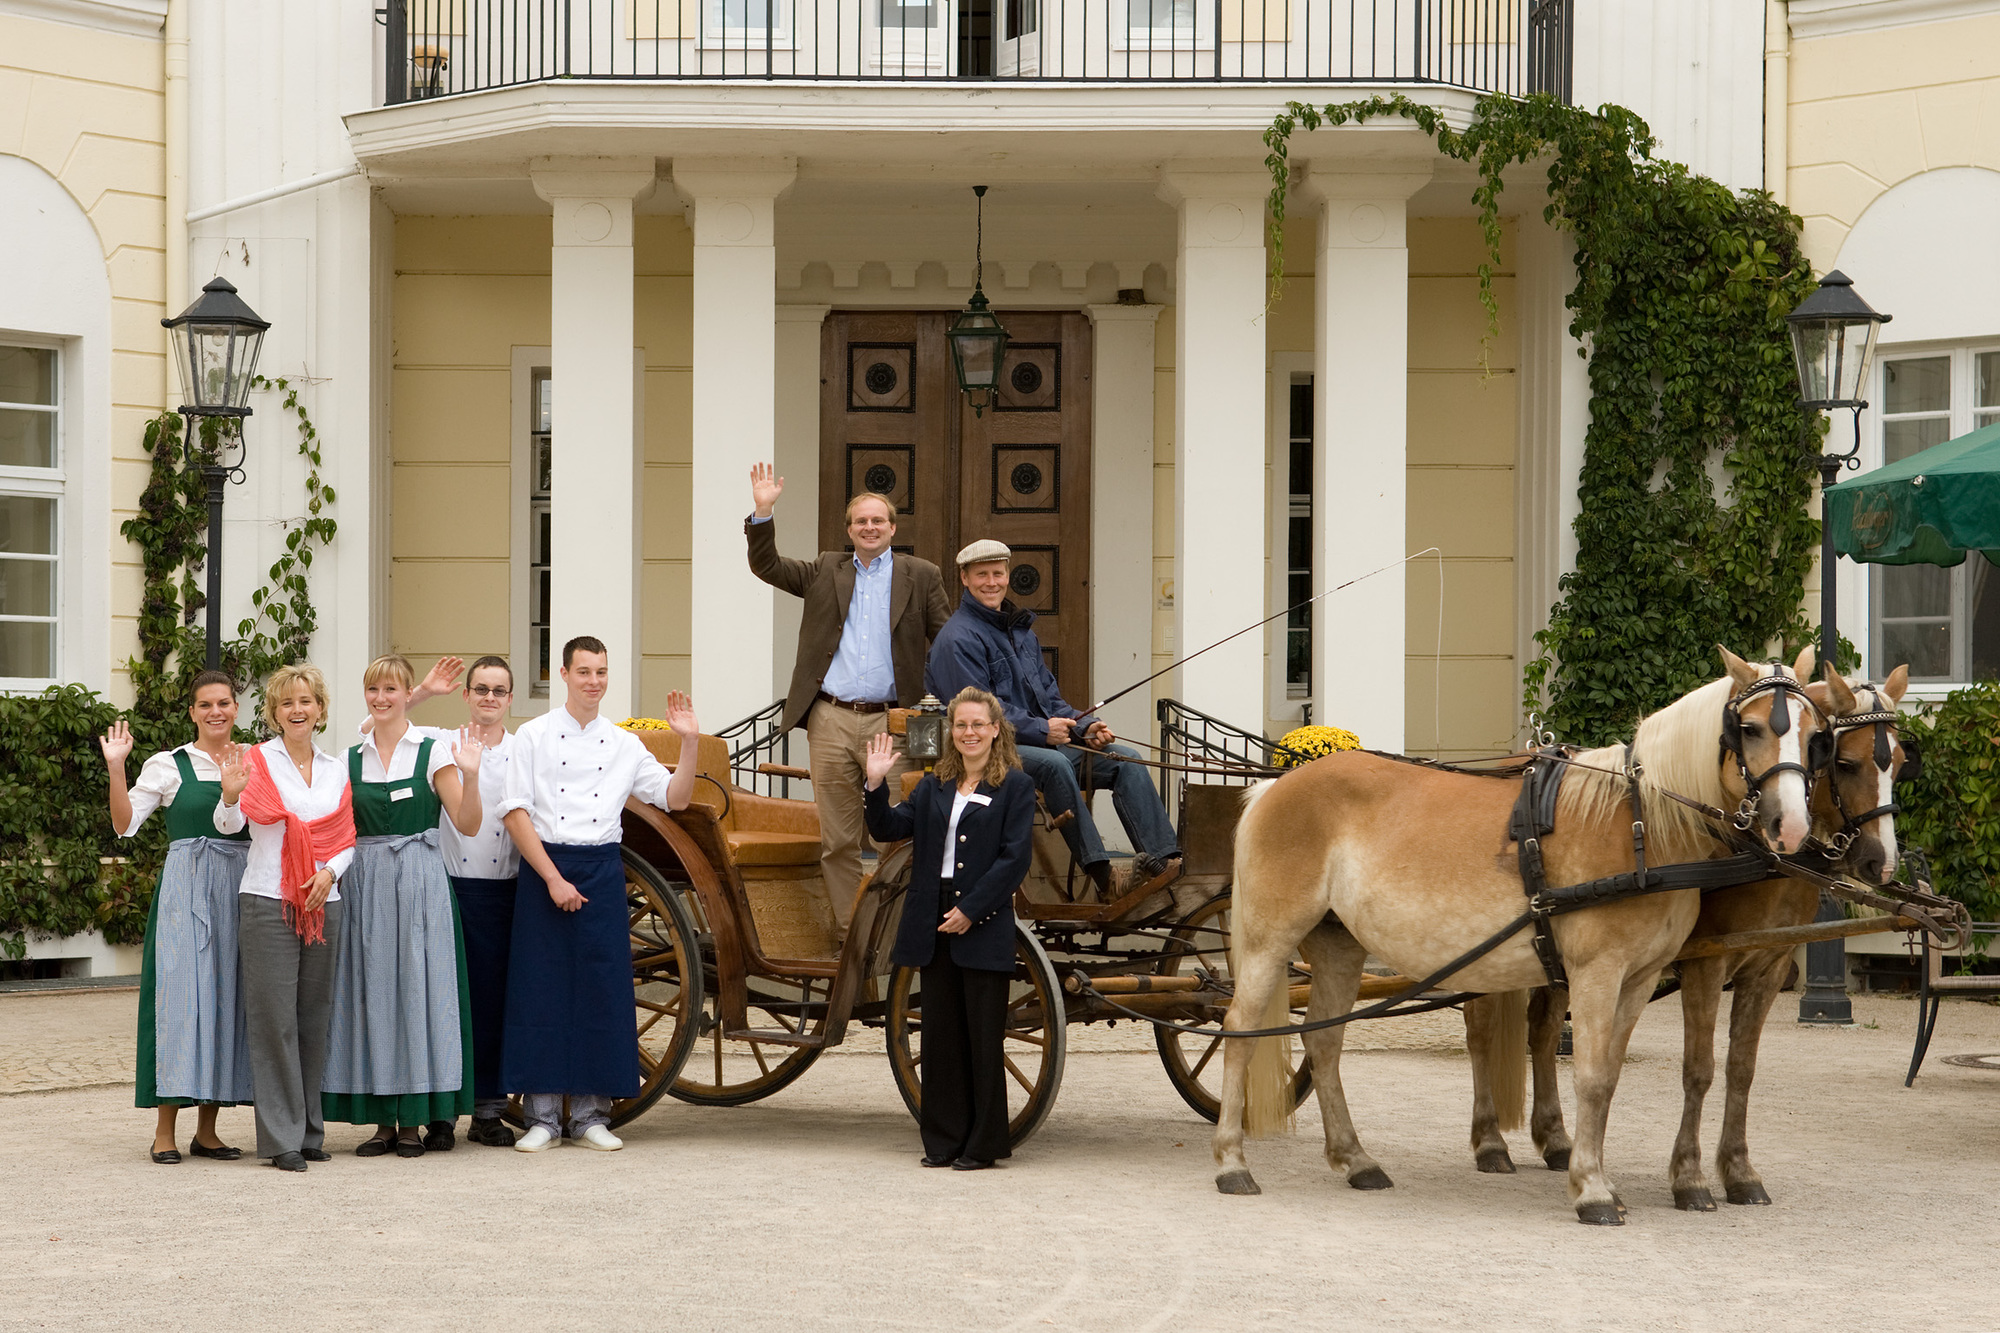 Kurzurlaub Spreewald - Unterkunft Spreewald - ?bernachtung Spreewald - Schloss L?bbenau im Spreewald